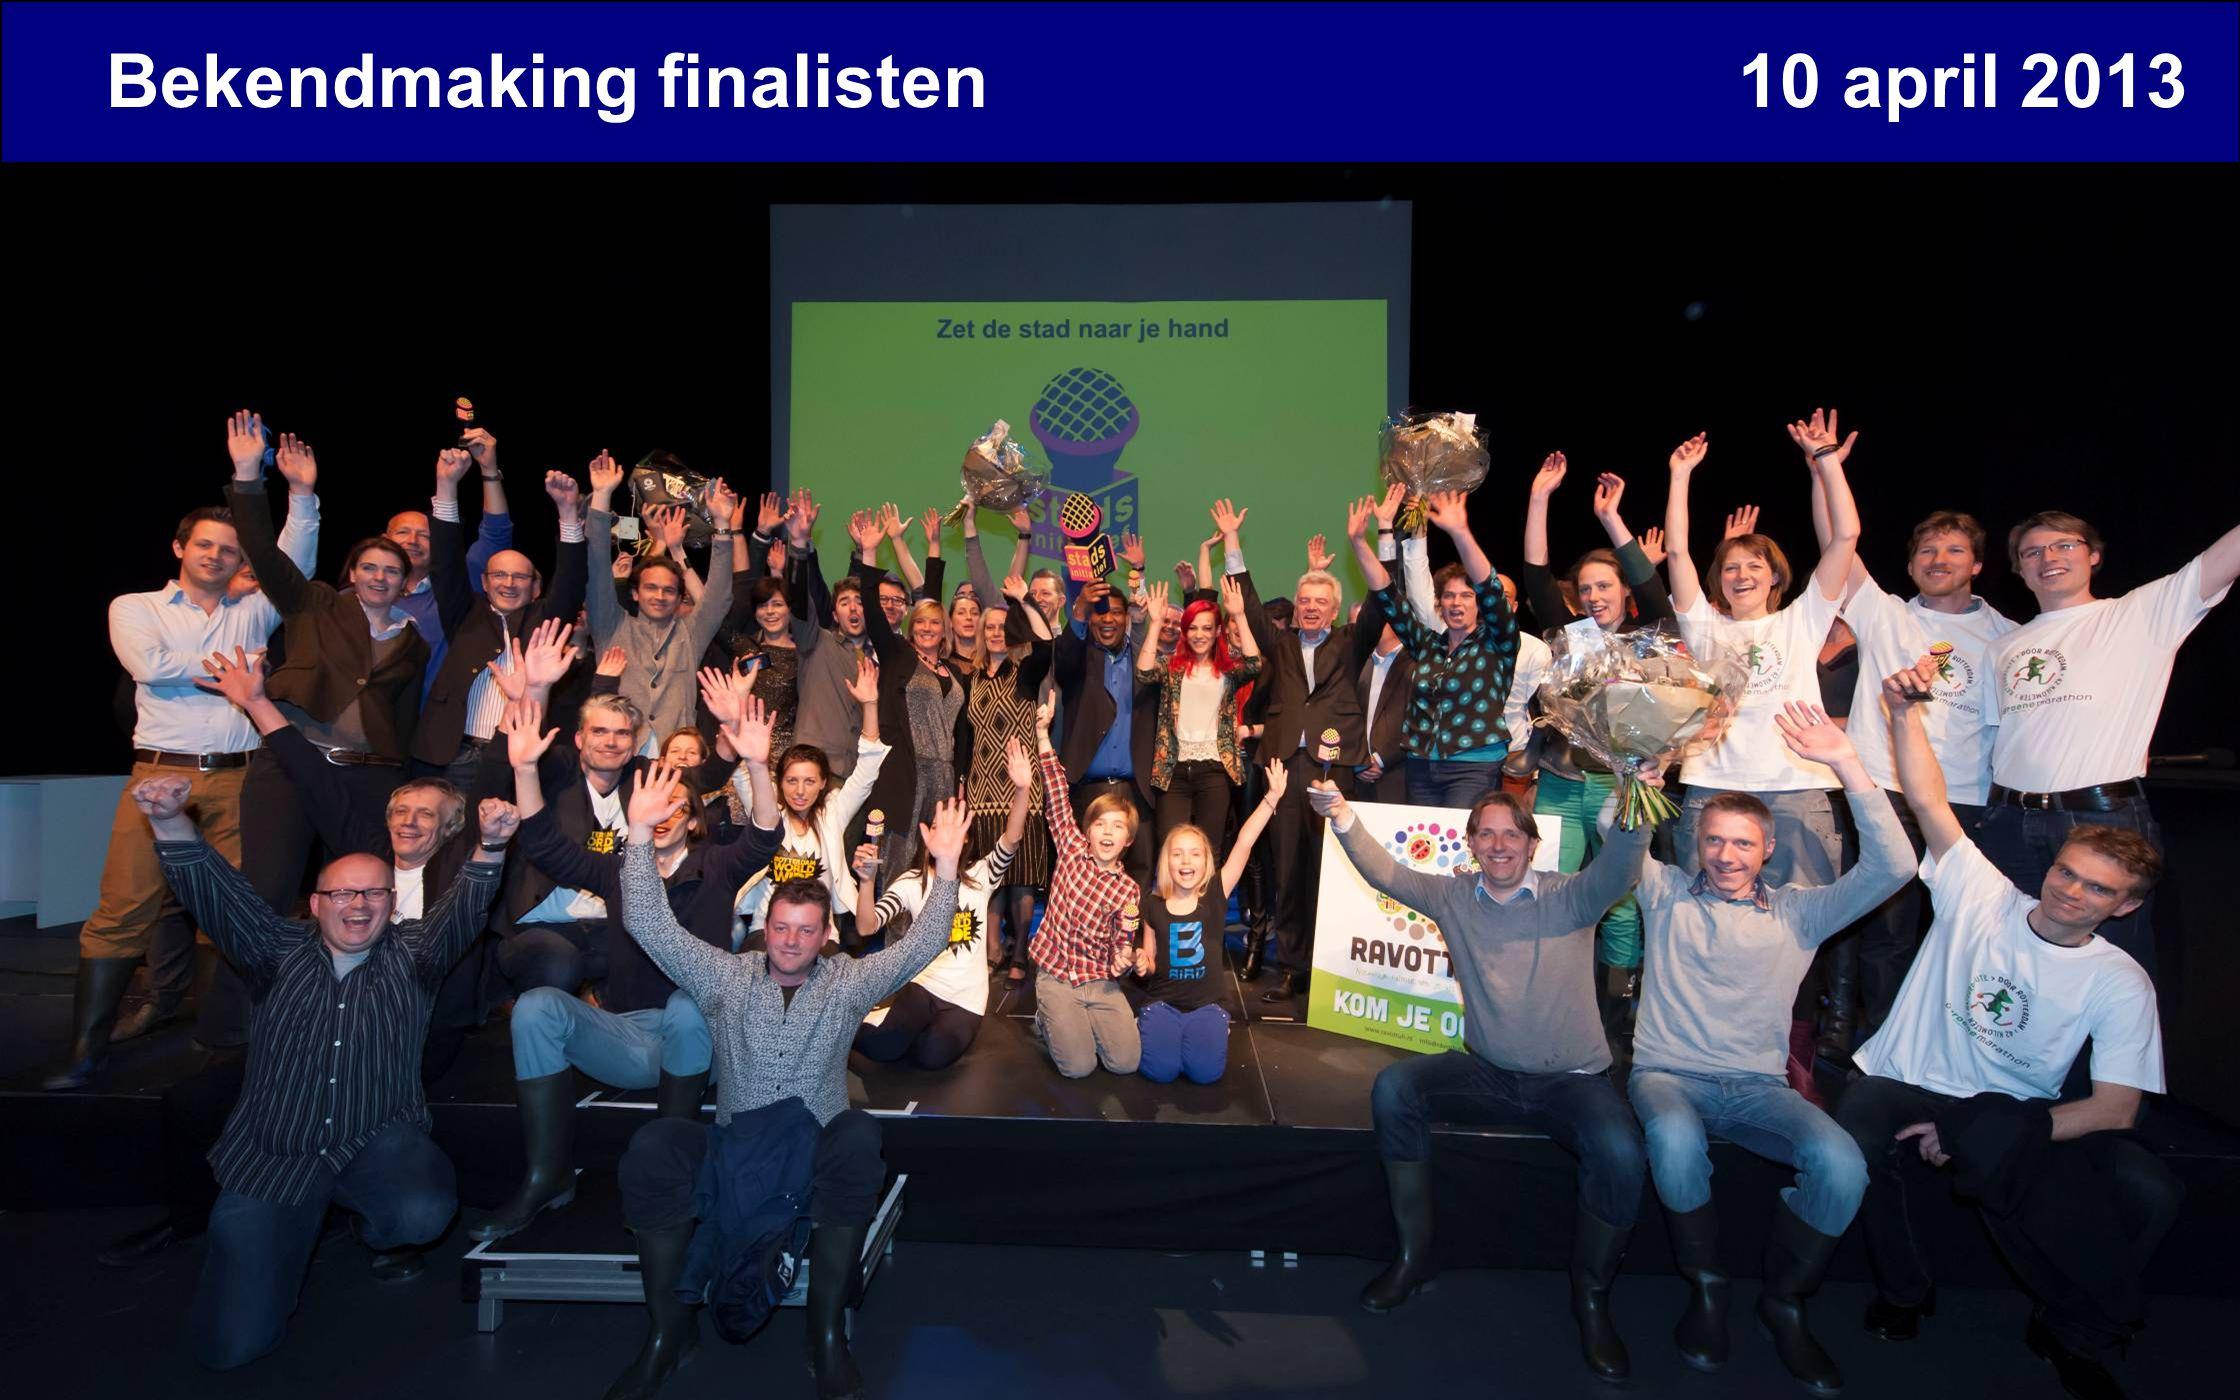 Bekendmaking finalisten 10 april 2013